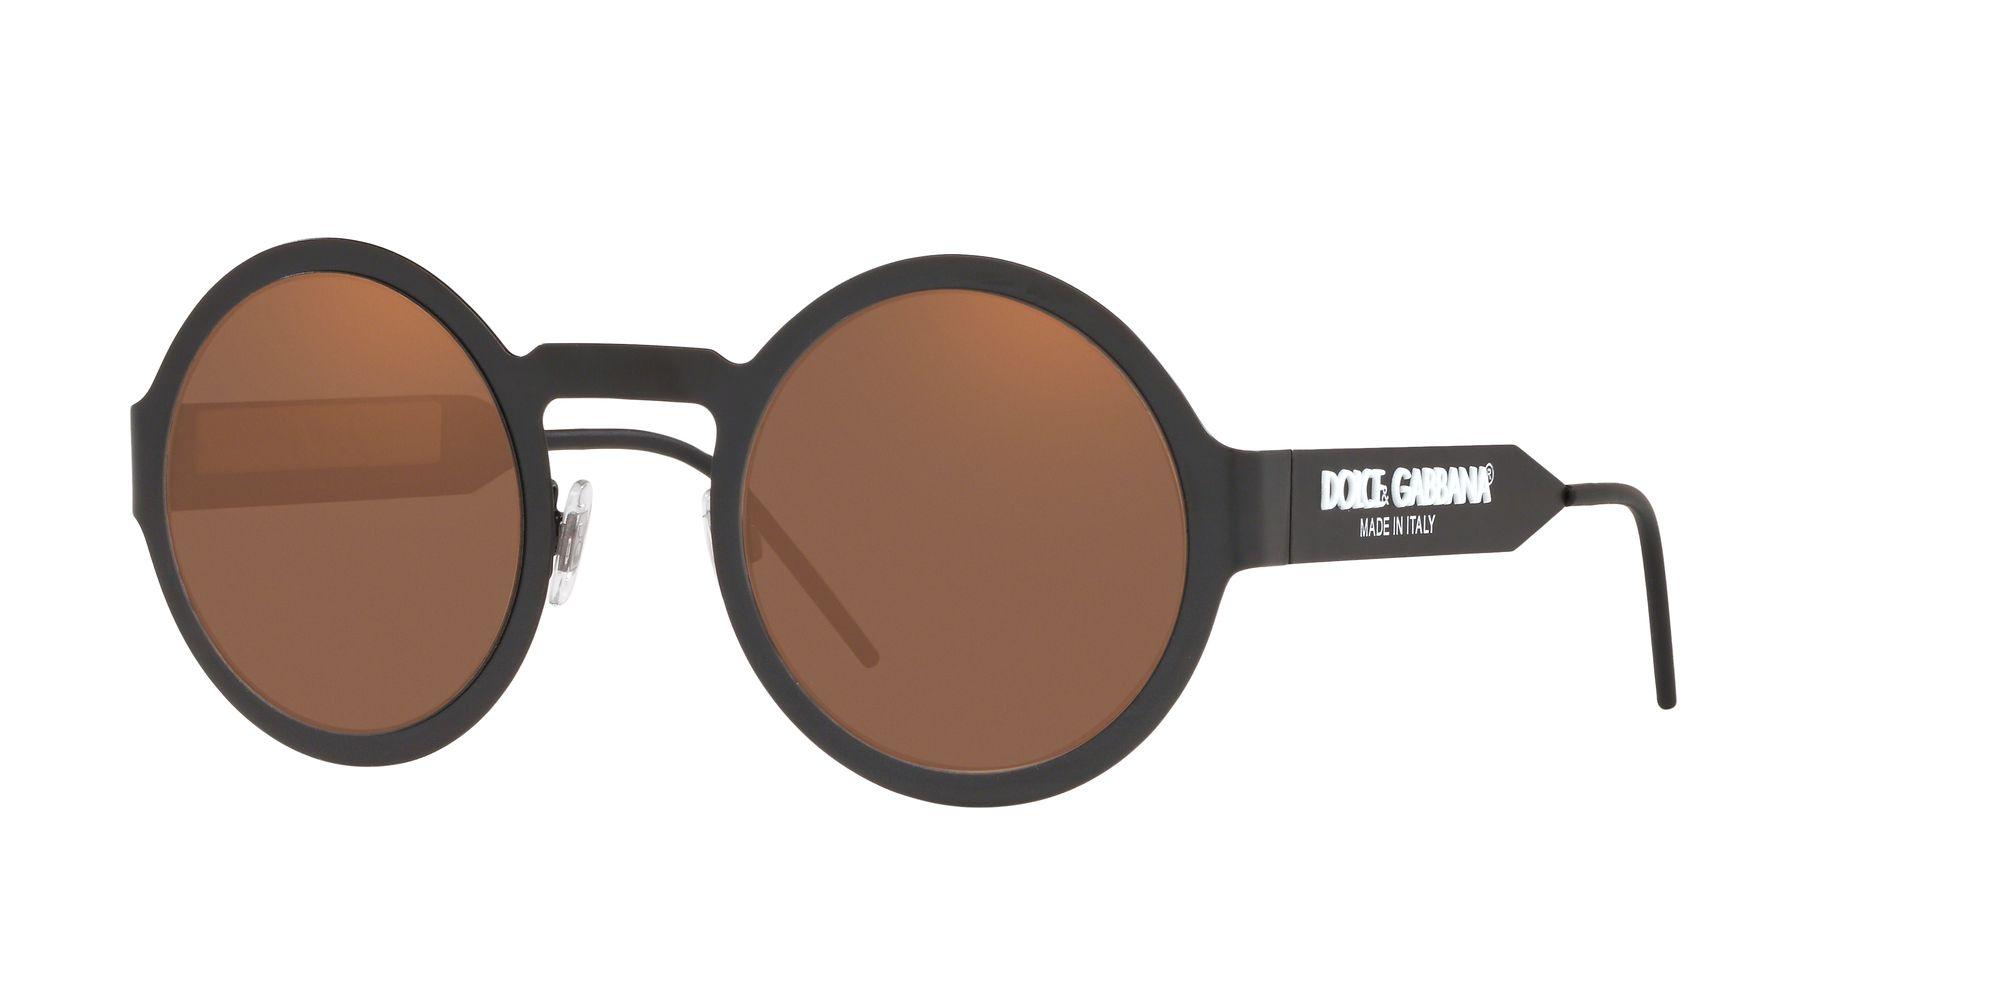 Dolce & Gabbana Dolce & Gabbana DG2234 Women's Round Sunglasses, Black/Brown